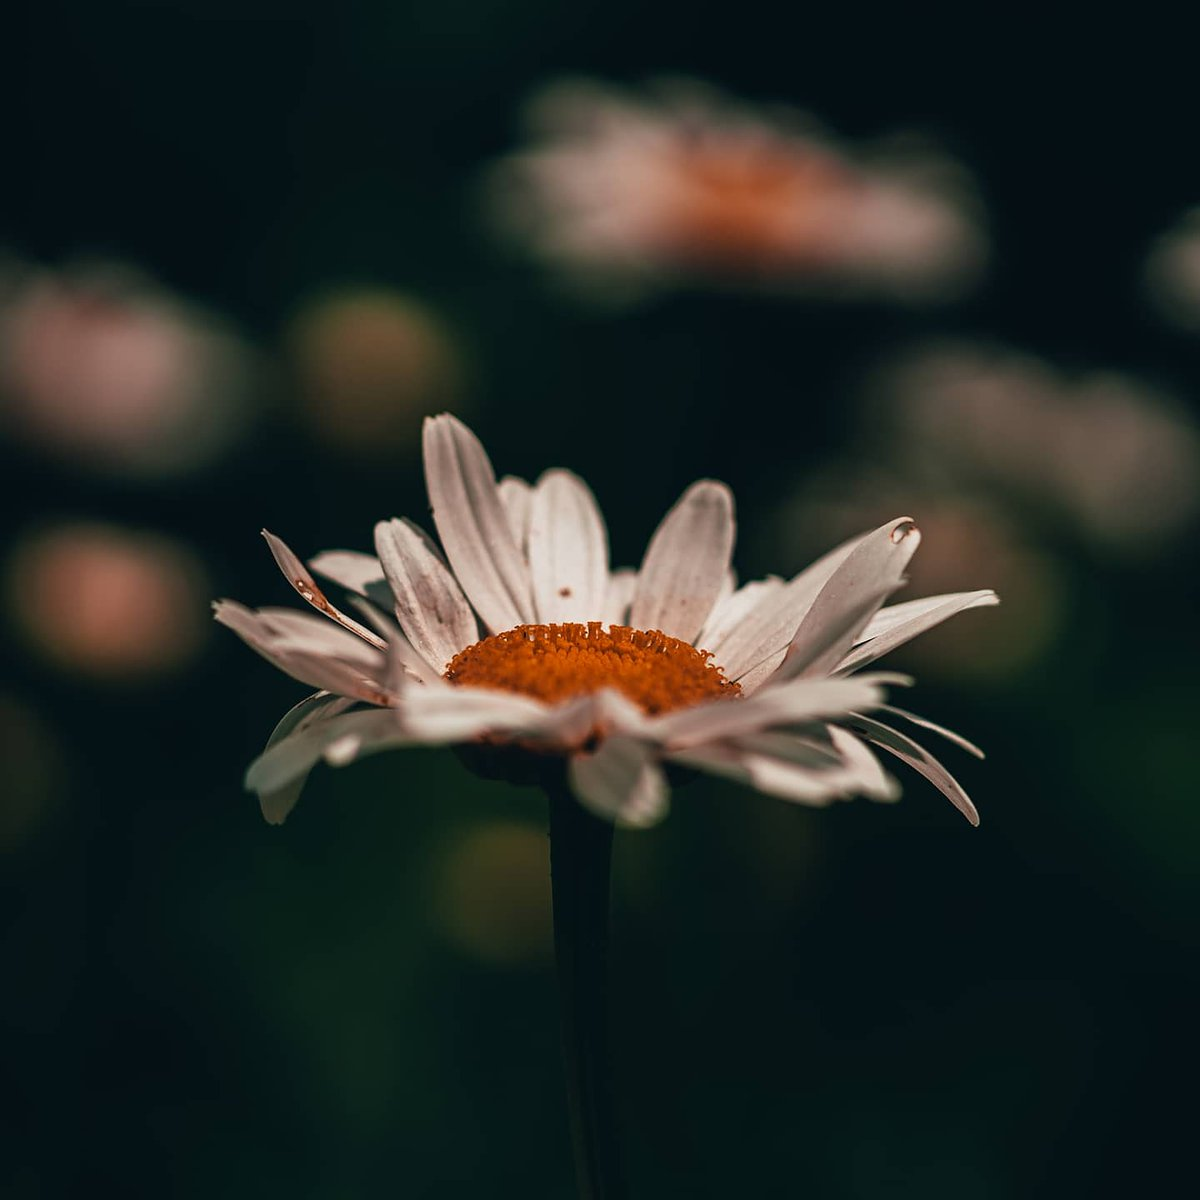 Sony a7riii Sony 90mm macro  1/3200sec | f/2.8 | ISO 100  #sony #sonyalpha #sonyphotography #bealpha #alphagang #sonya7riii #a7r3 #a7riii #sel90m28g #flowers #flower #flowerphotography #nature #naturephotography #nature_moods #leaves https://t.co/PwUA16CxEZ